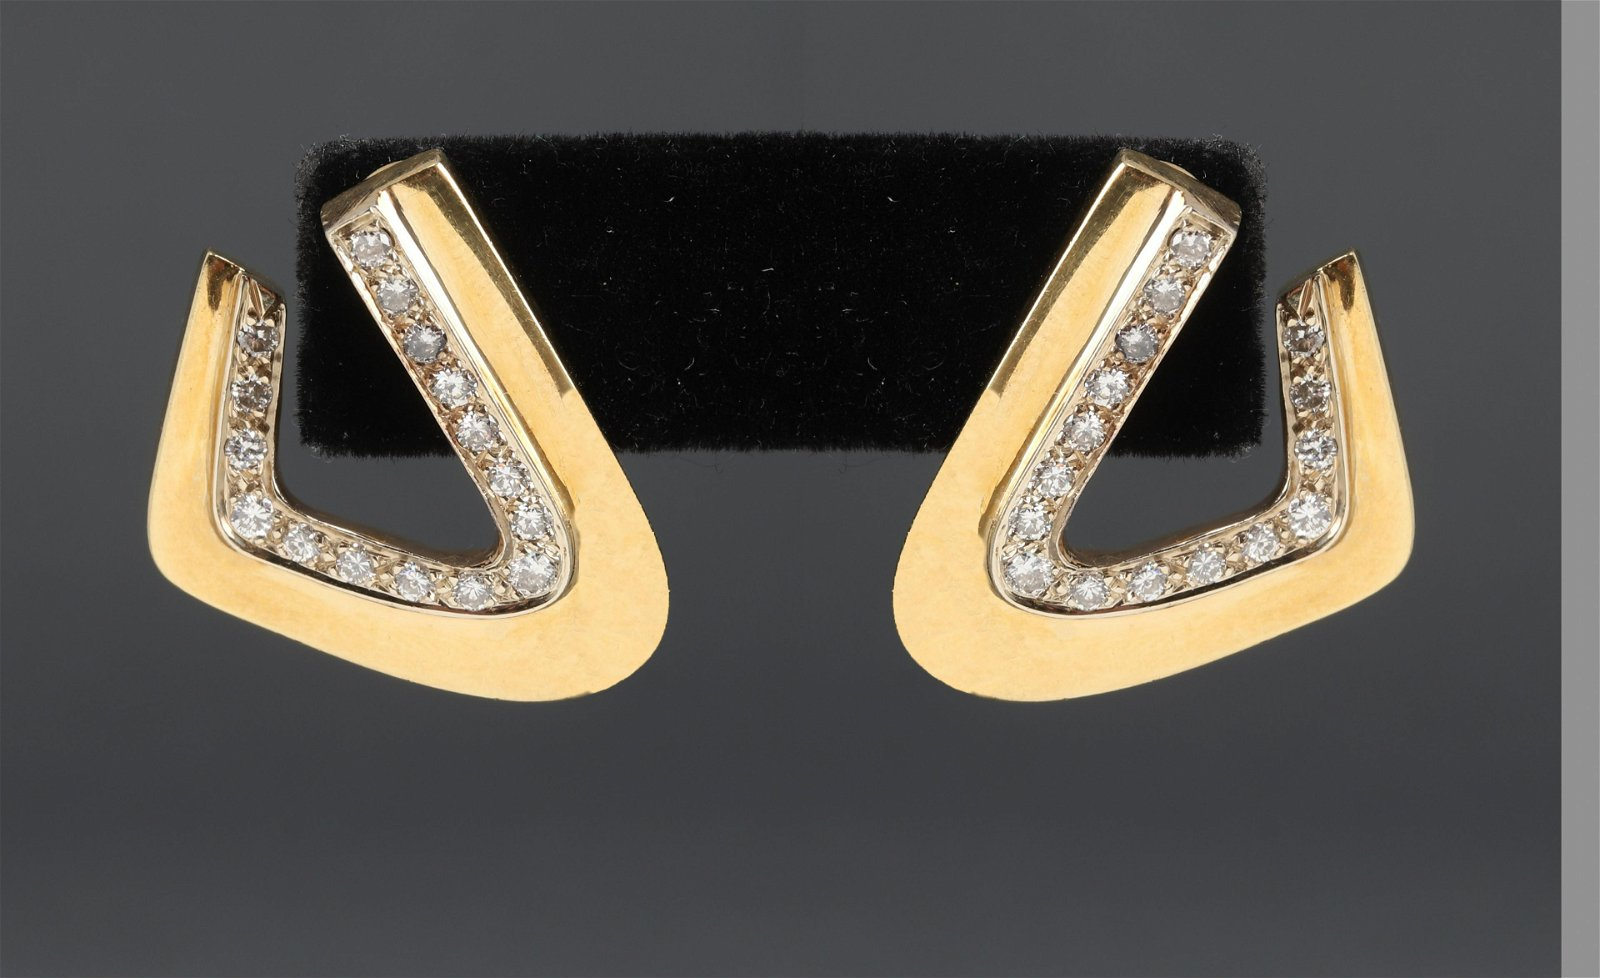 18K Yellow Gold & Diamond Earrings